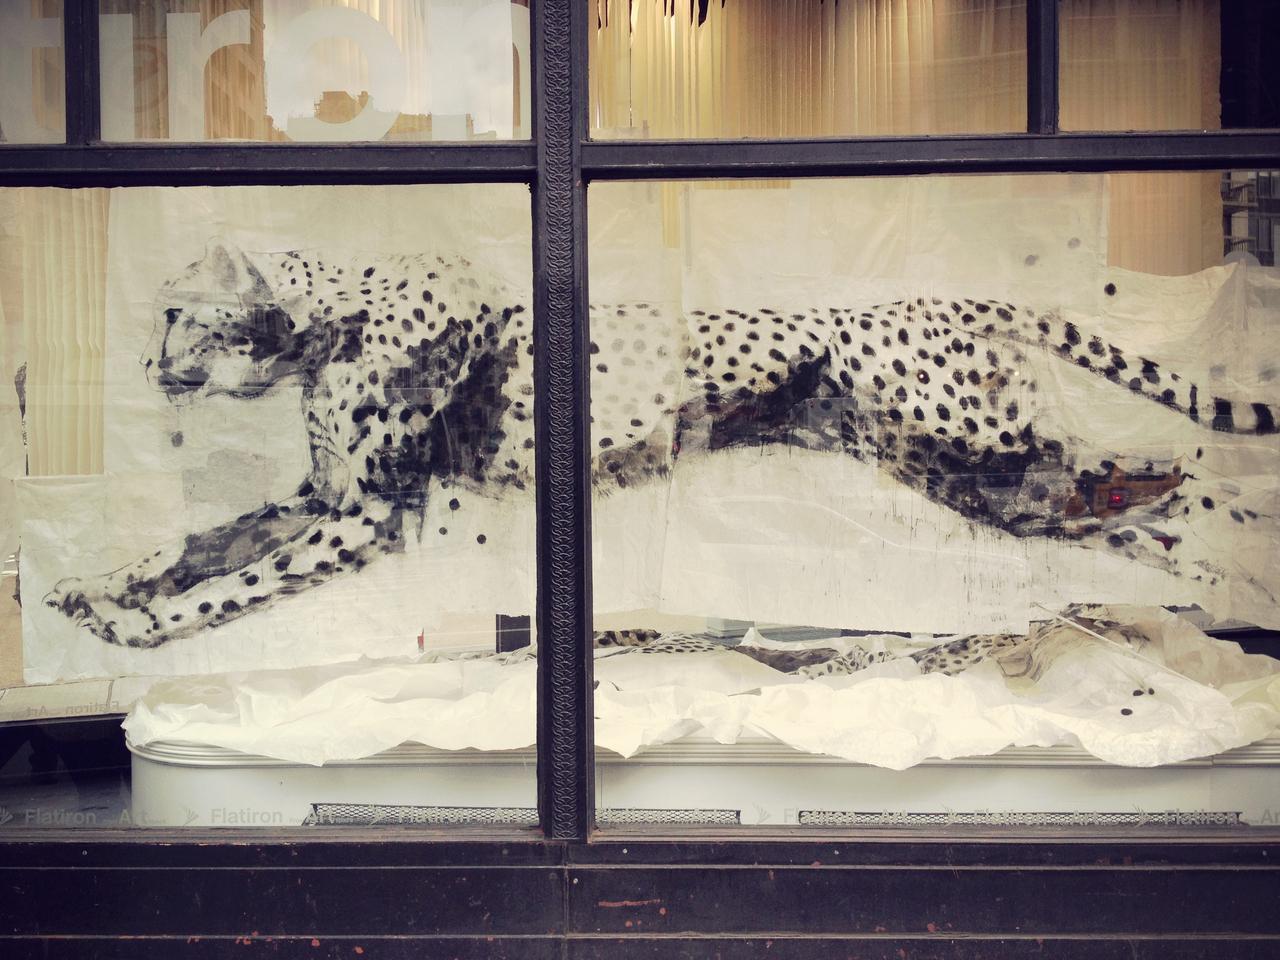 Leopard in Window #peppersearching #pepper #photos #leopard #window #painting